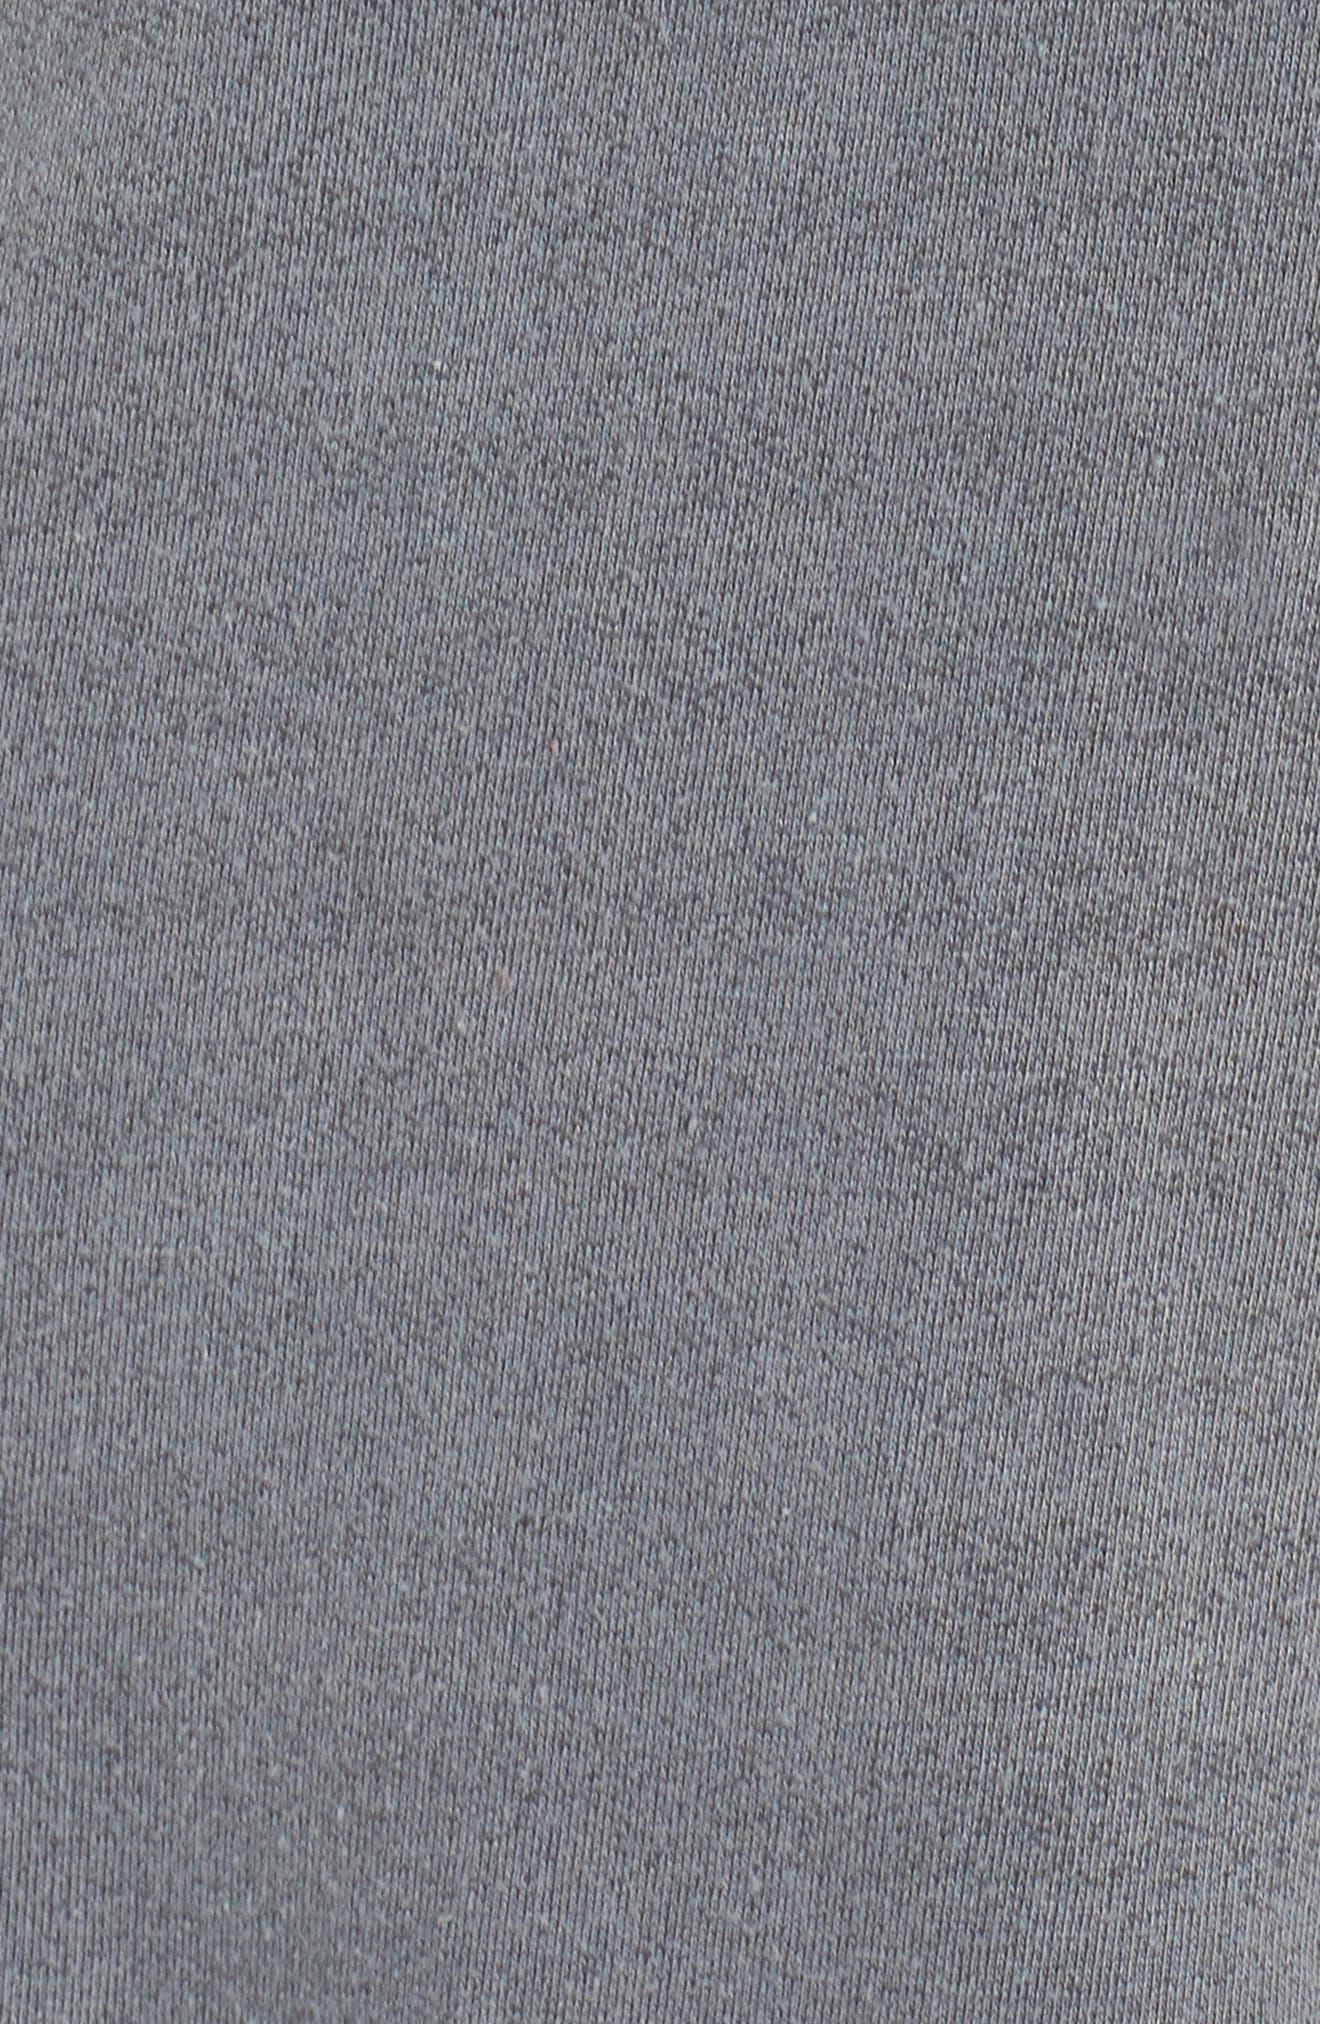 Lounge Sweatshirt Dress,                             Alternate thumbnail 6, color,                             Faded Black